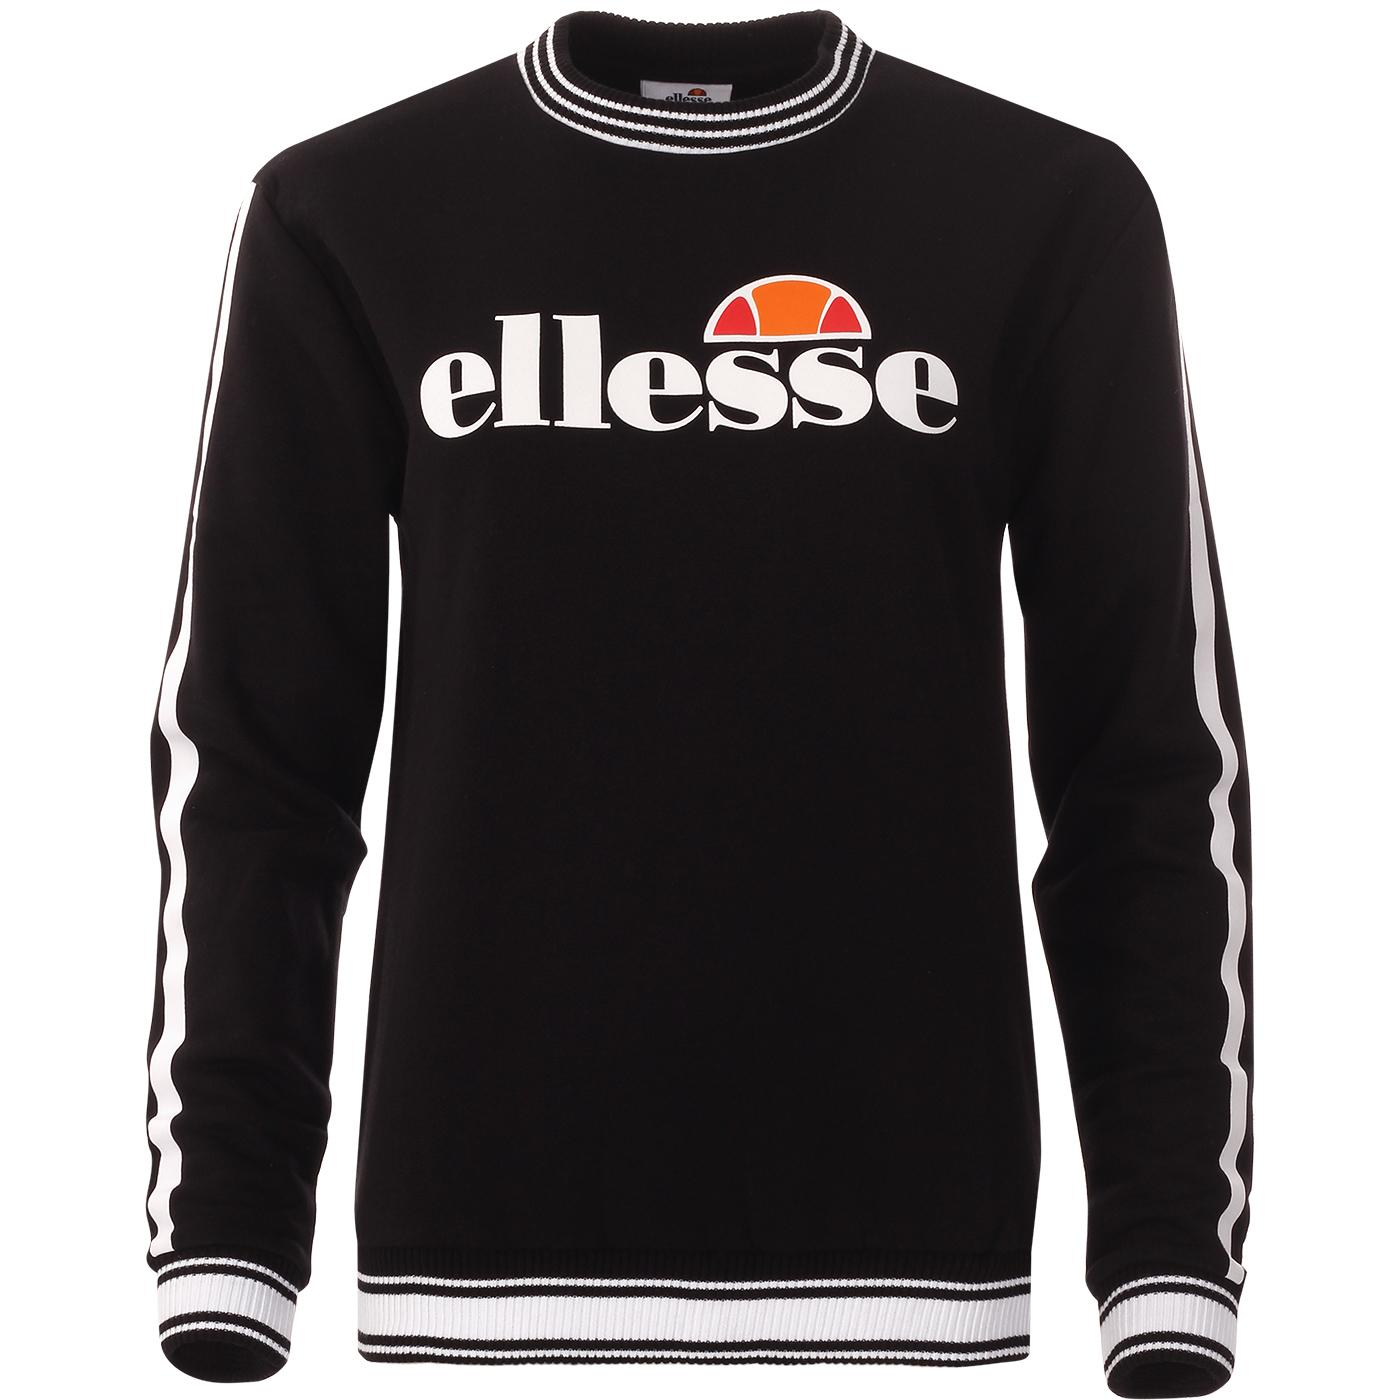 Susana ELLESSE Women's Retro Tipped Sweatshirt B